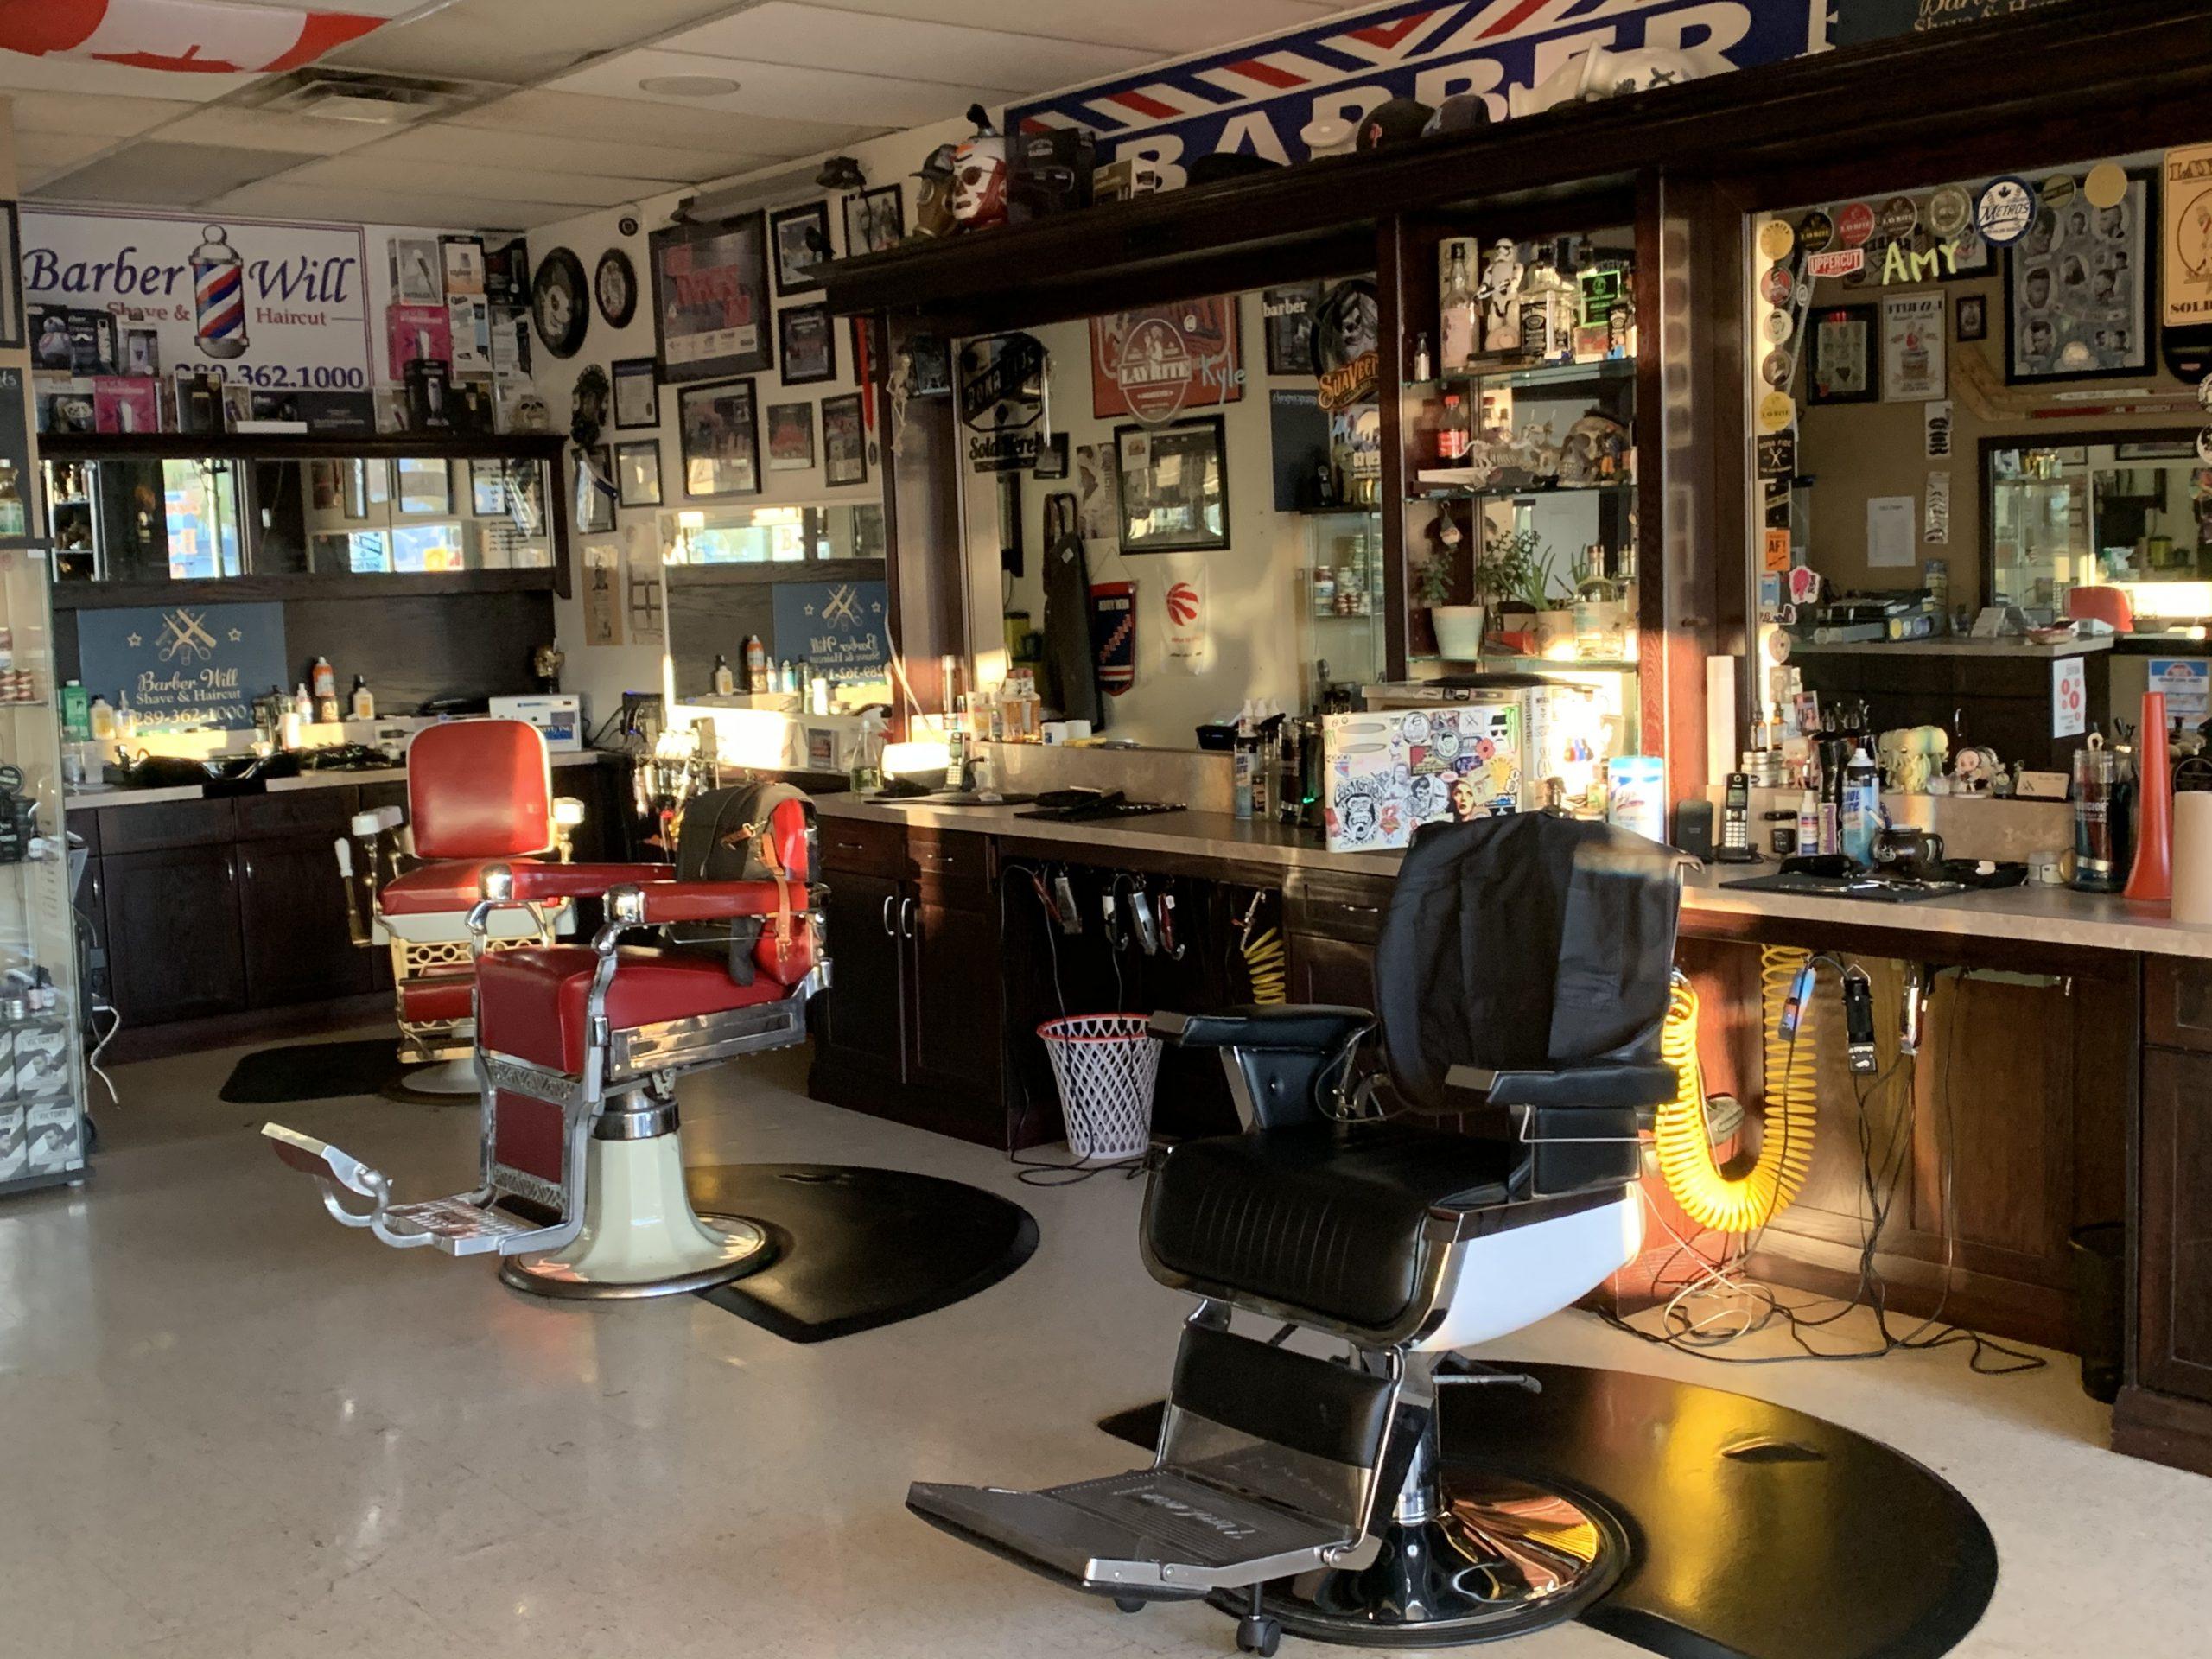 Barber Will Barbershop